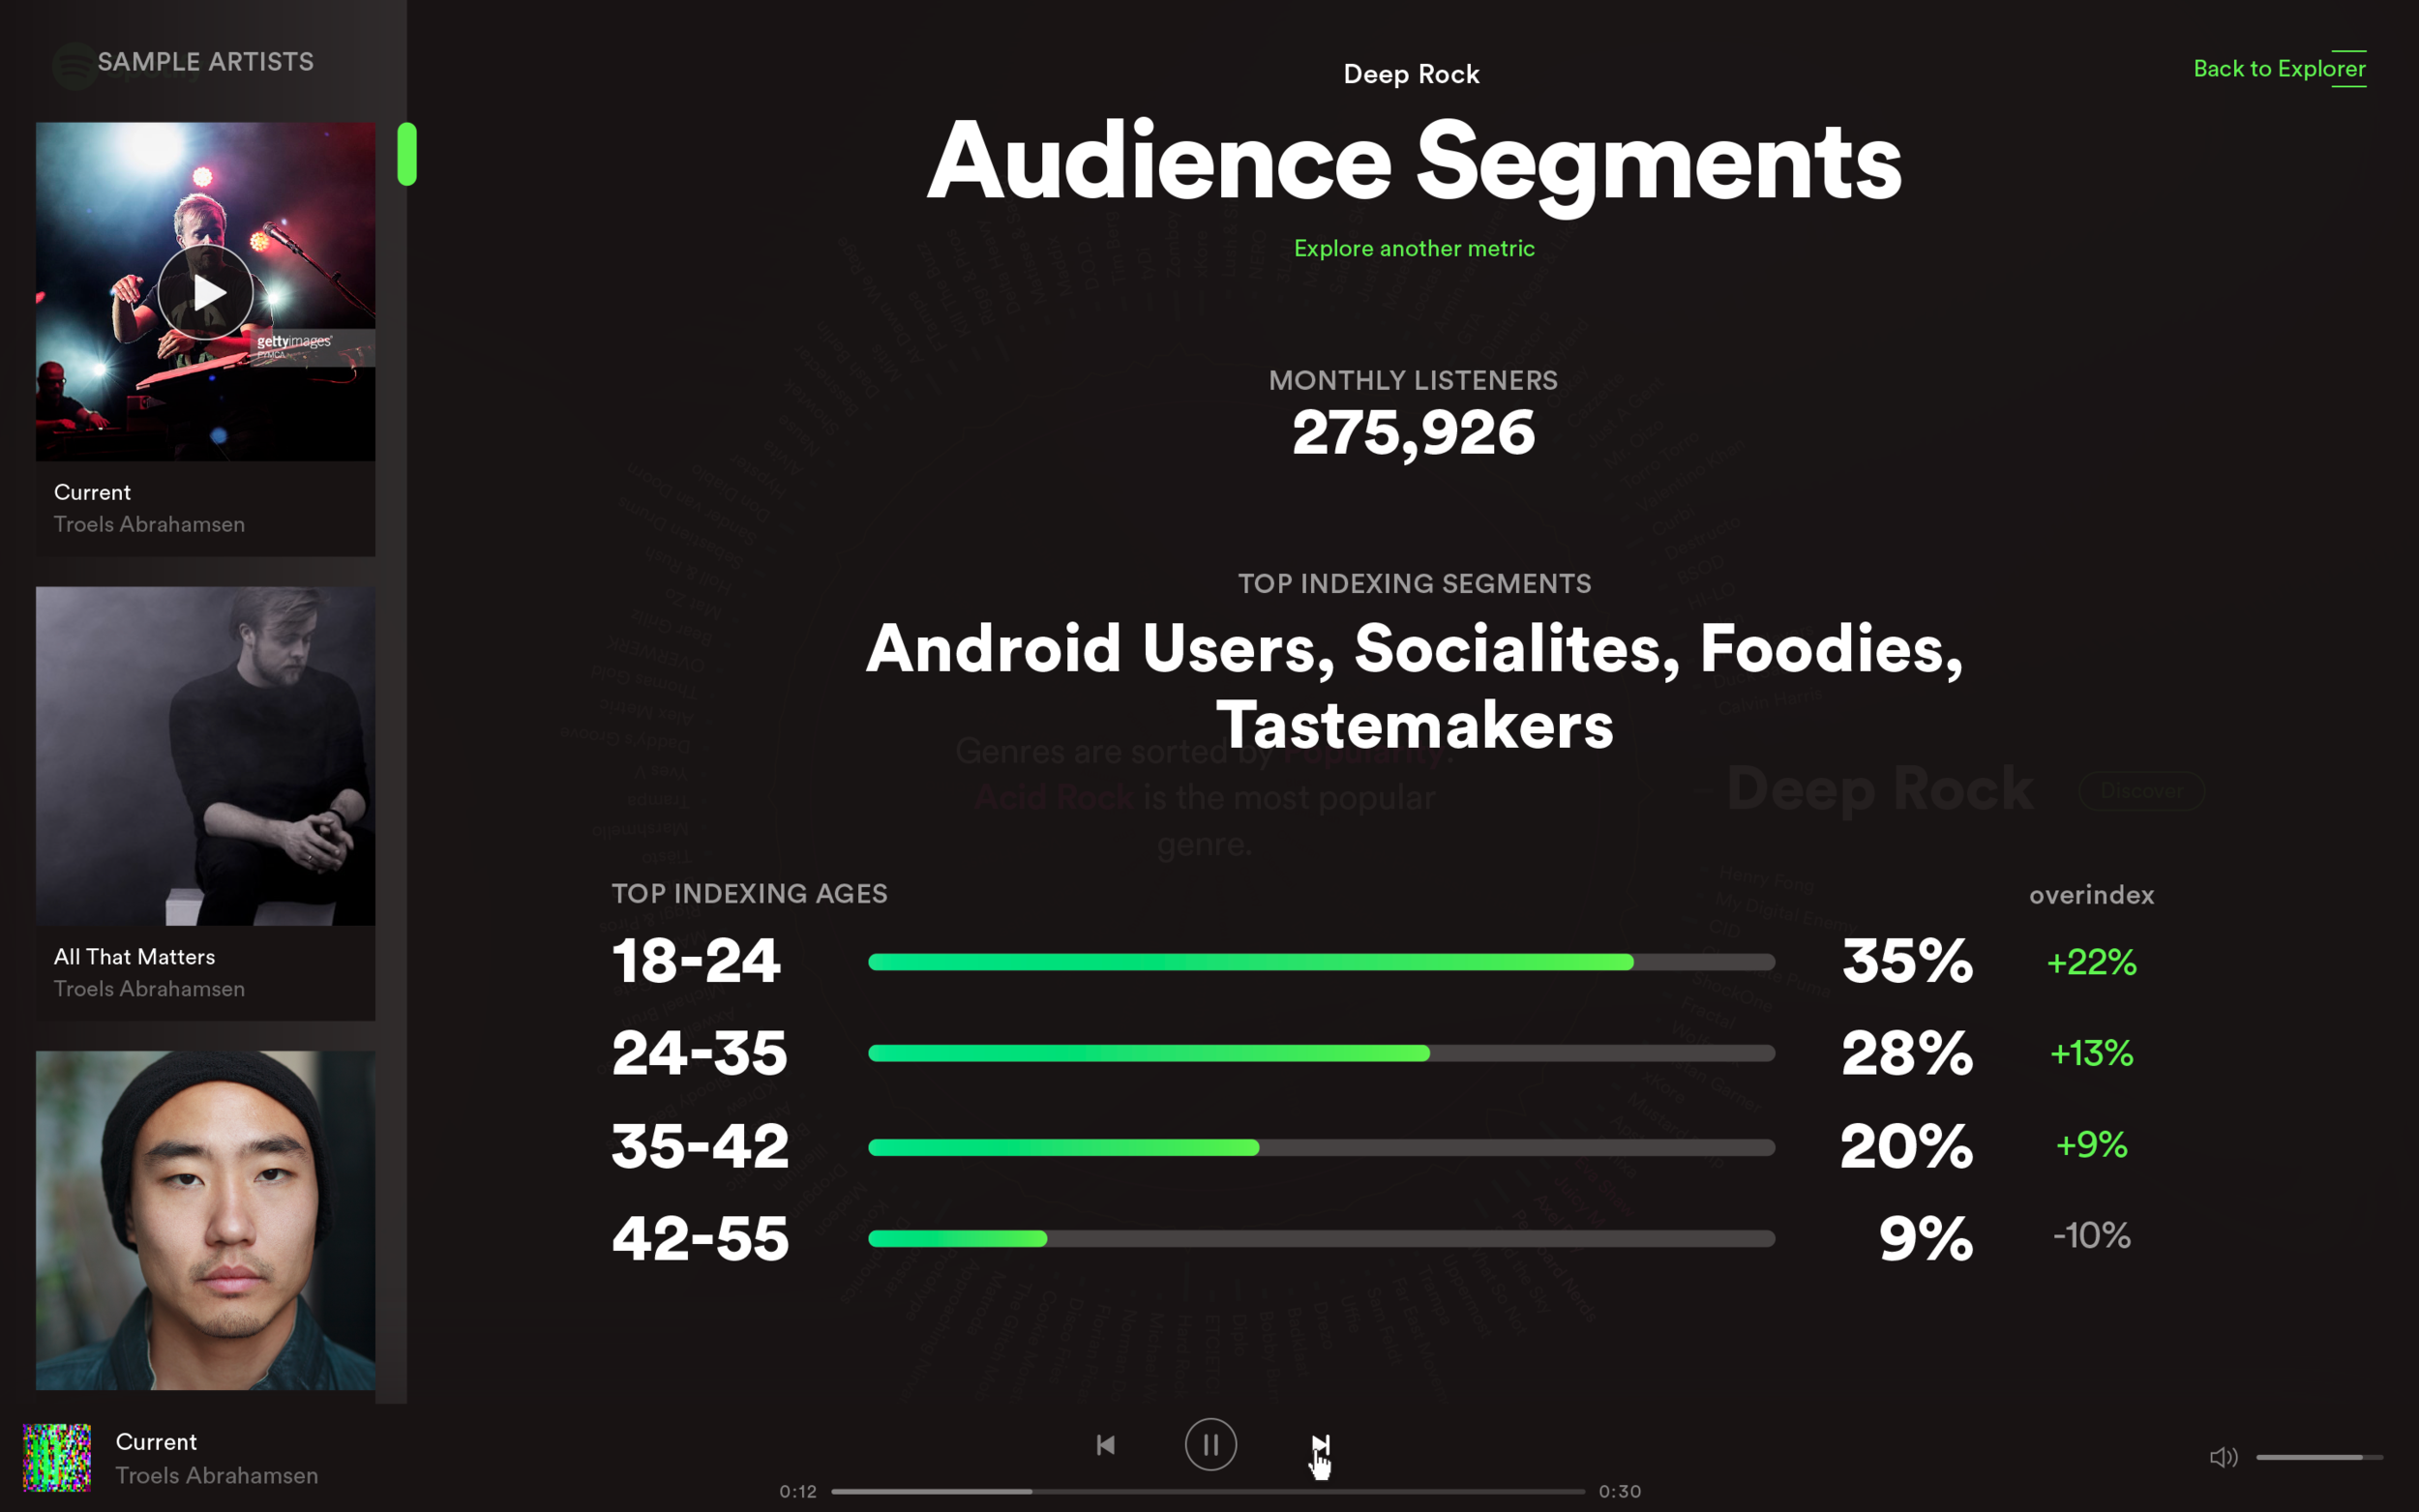 Audience segments visualized